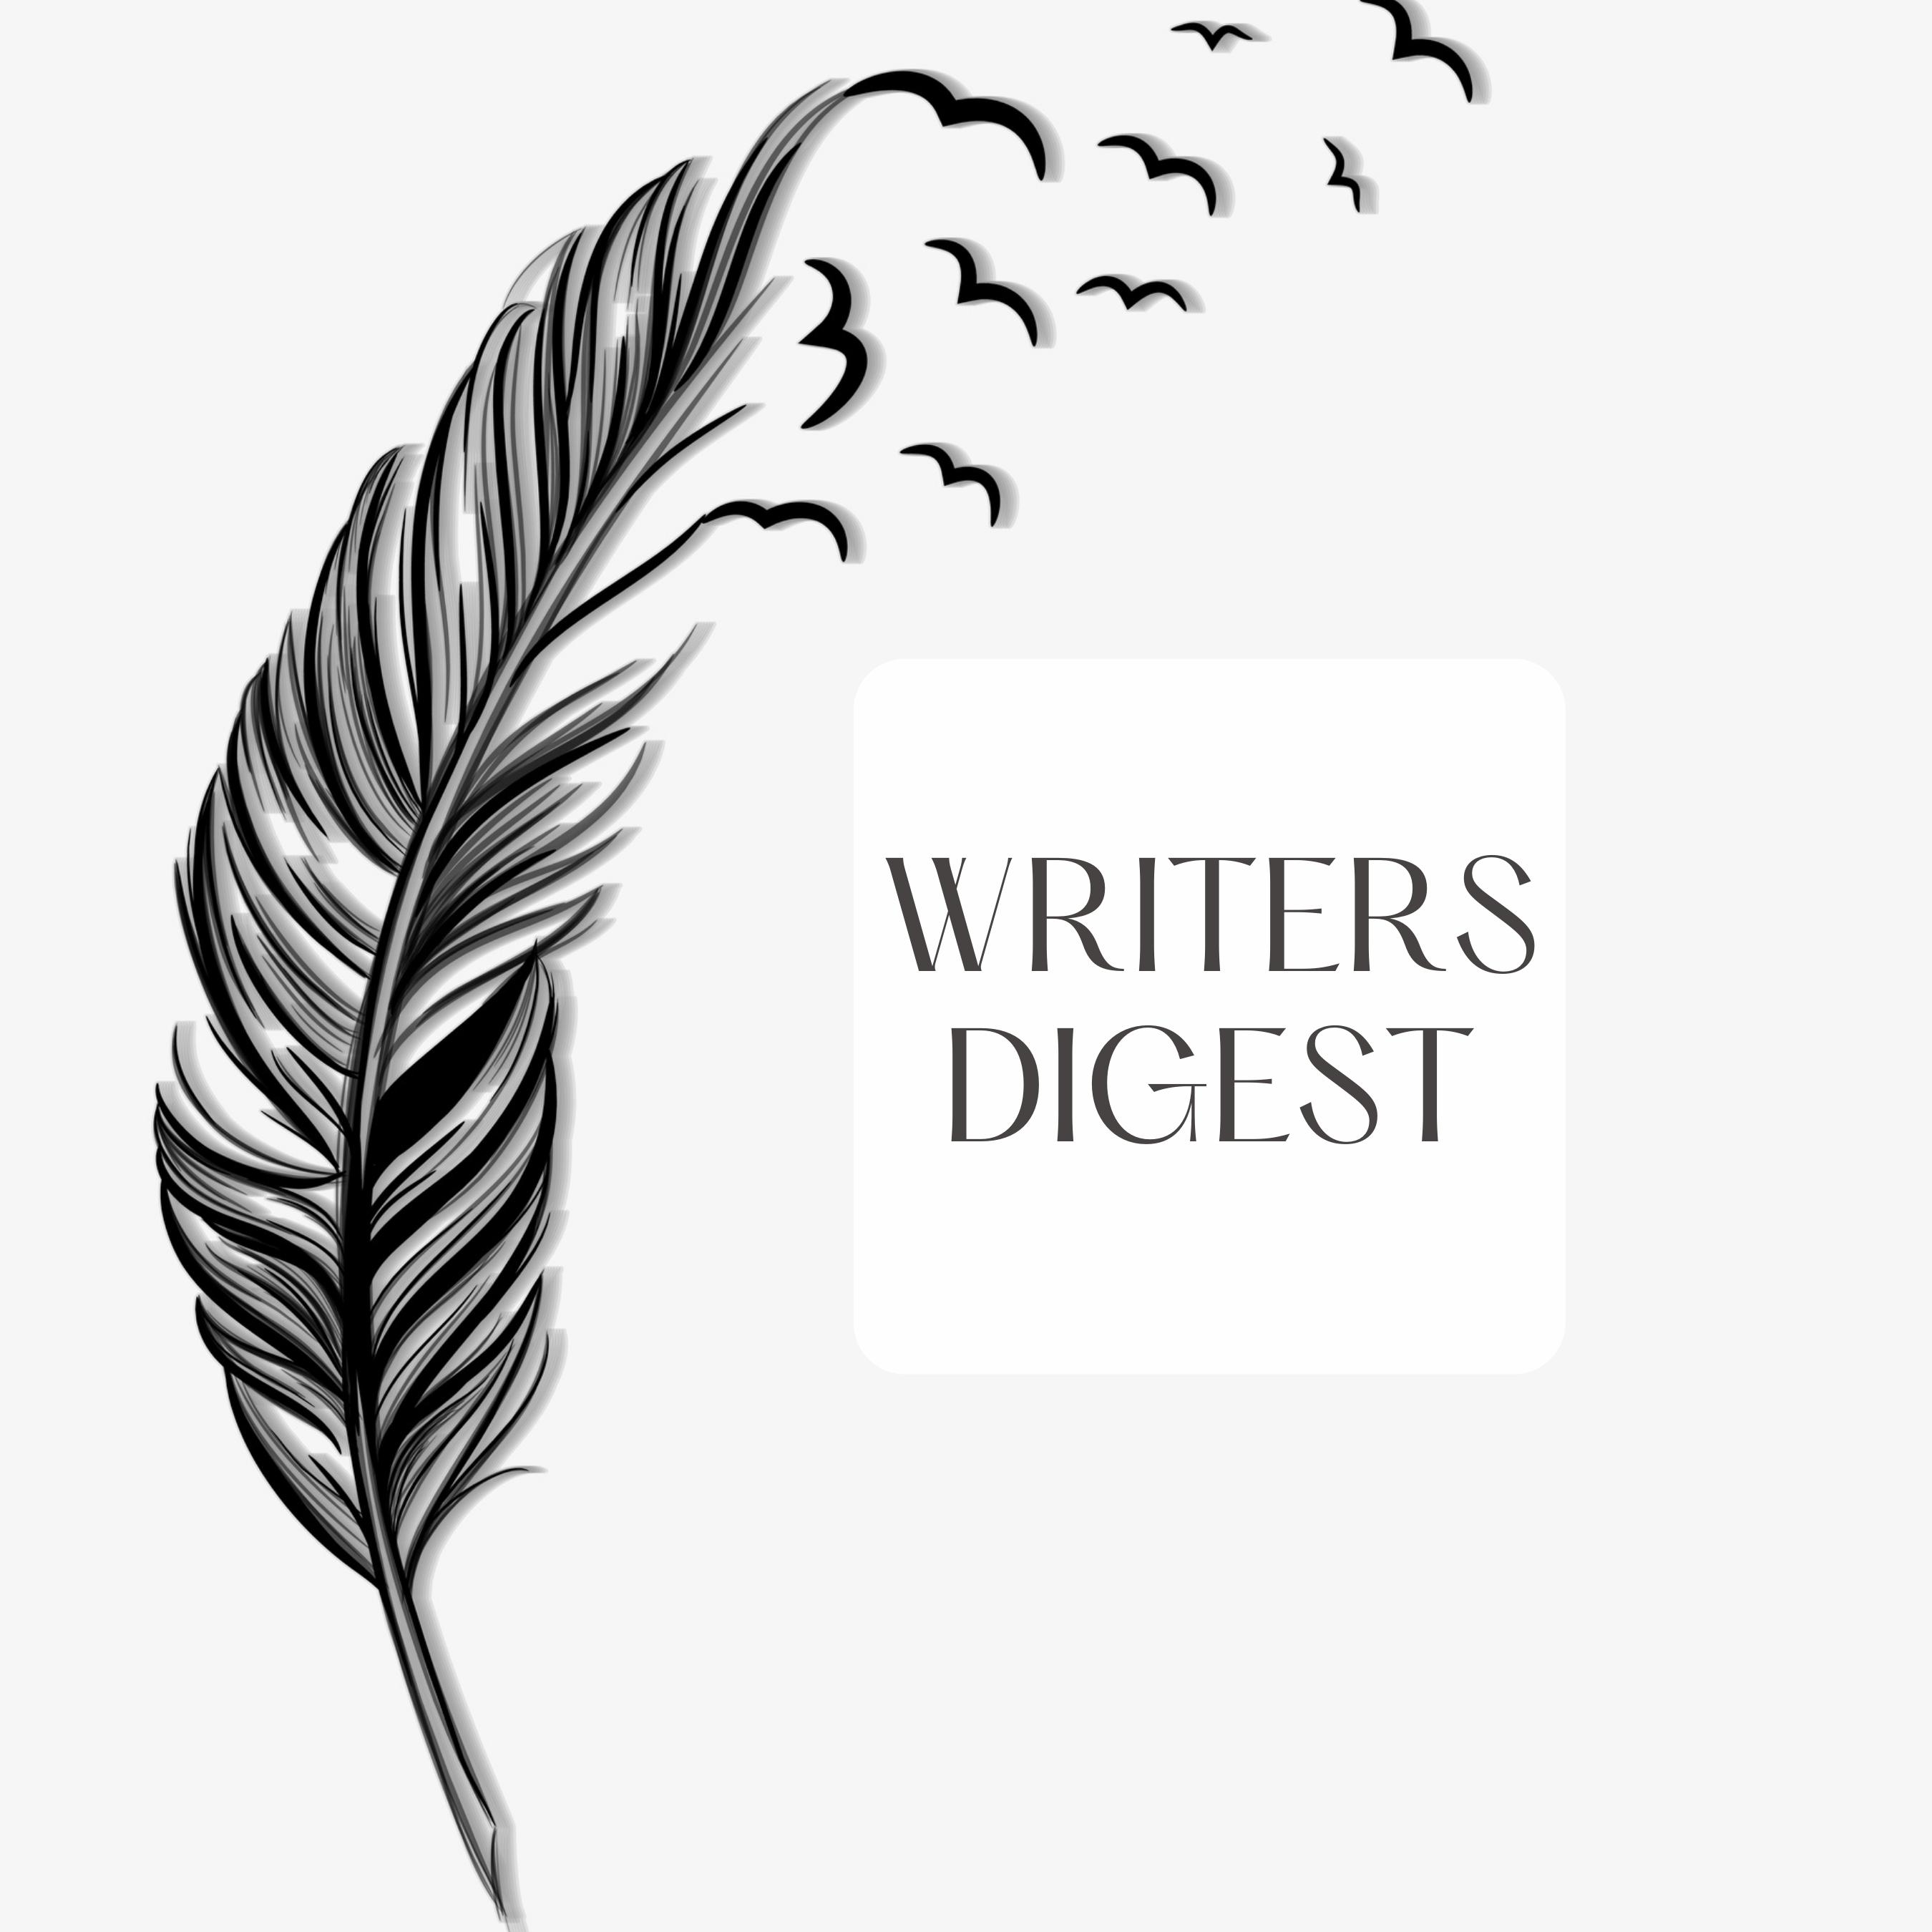 Writer's Digest: Monday, September 6, 2021